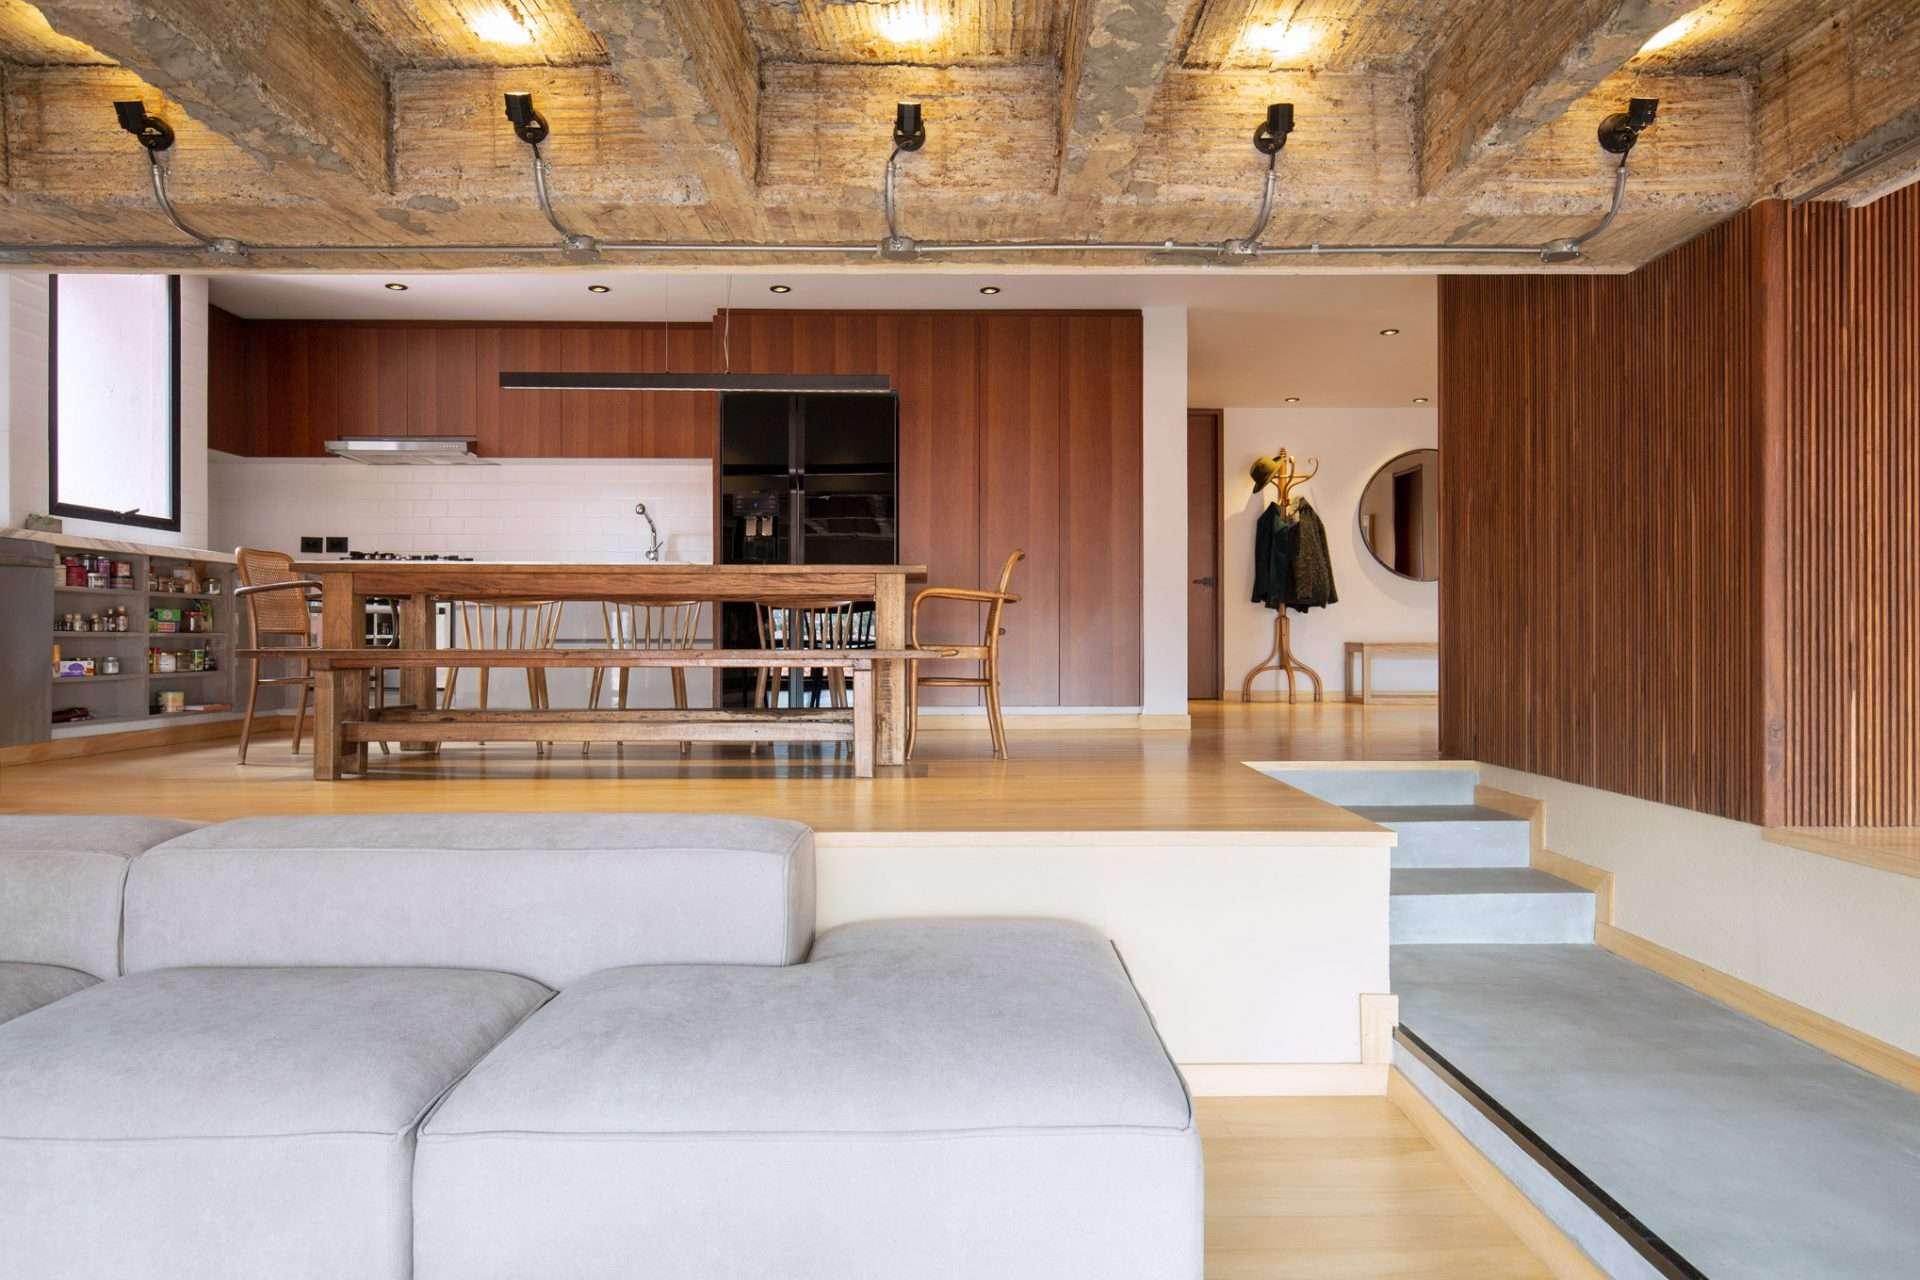 03.MLS_arquitectura_taller_tragaluz_interior_dutch_bogota_colombia_simon_bosch_photography